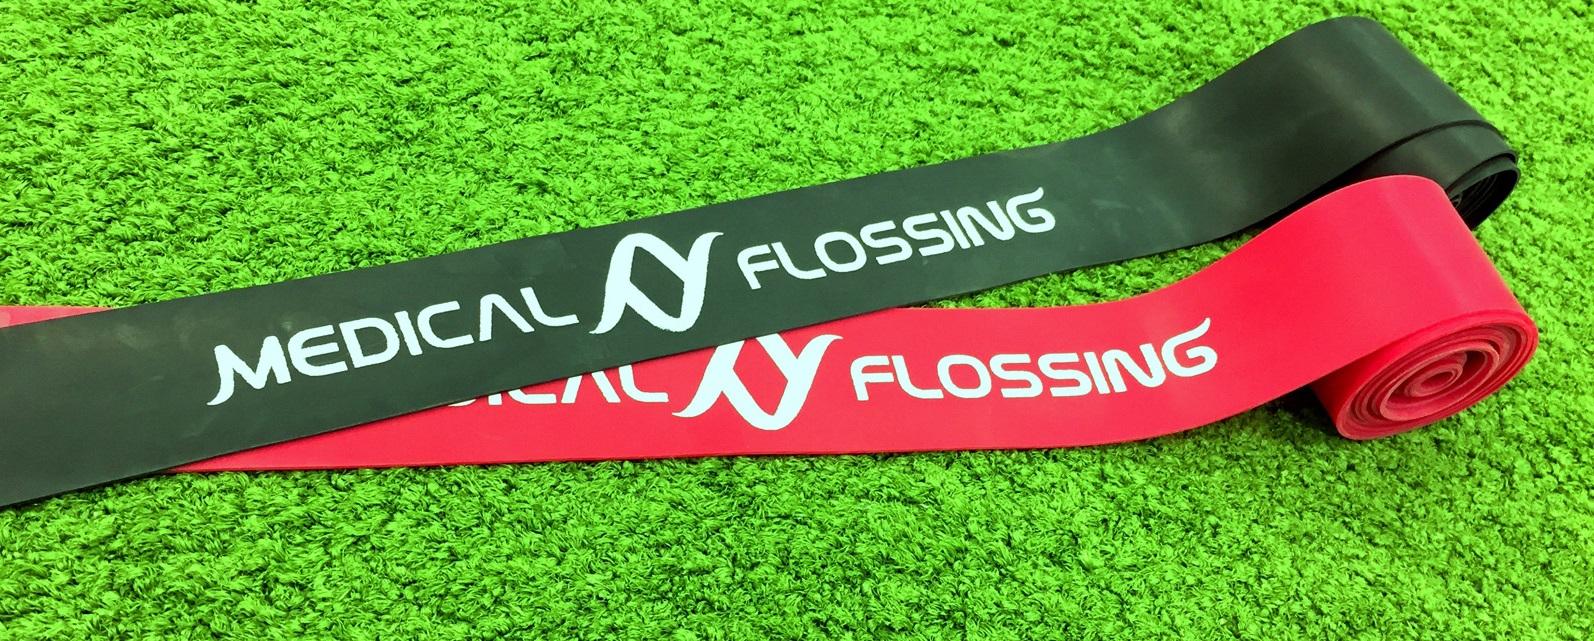 Flossing-Band 1,3 mm Schwarz